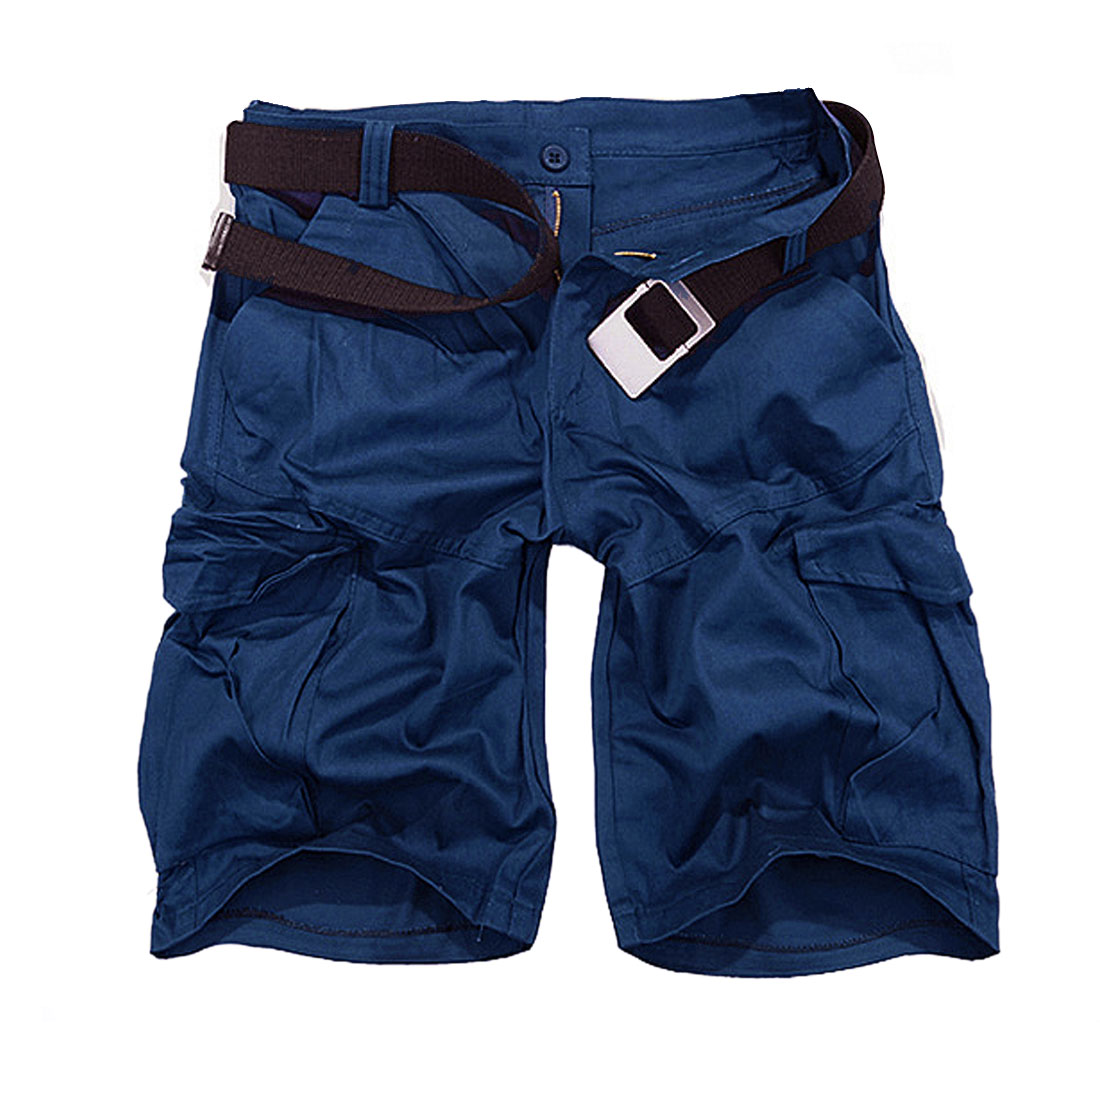 Men Waistband Loop Zip Closure Side Pockets Casual Short Pants Royal Blue W34